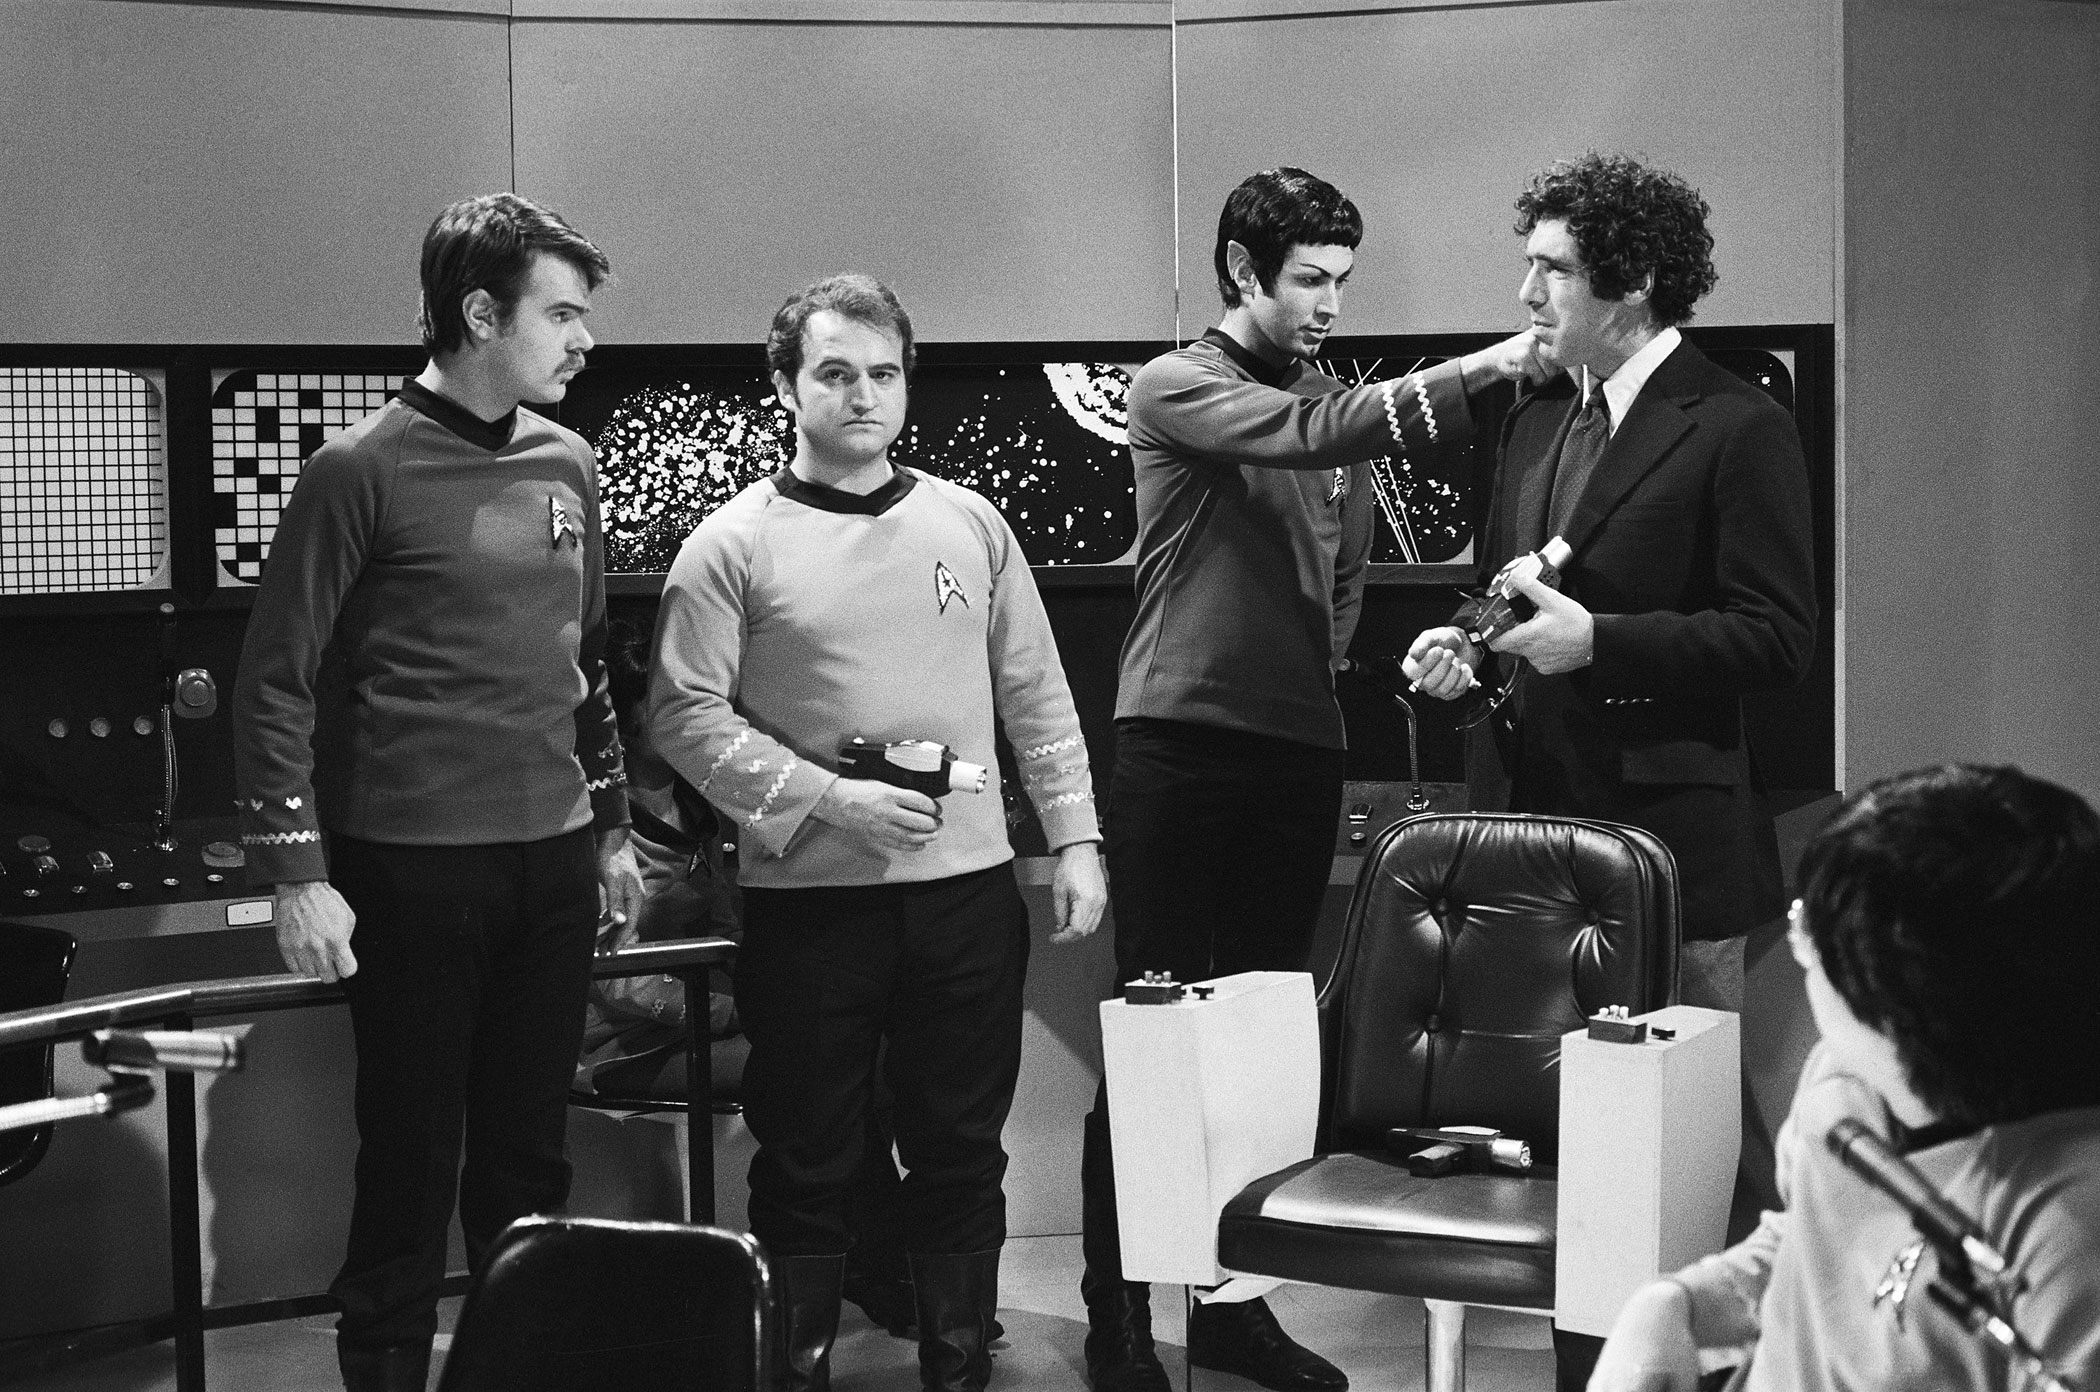 "Dan Aykroyd as Dr. McCoy, John Belushi as Captain Kirk, Chevy Chase as Mr. Spock, Elliott Gould as Herb Goodman and Akira Yoshimura as Mr. Sulu during ""The Last Voyage of the Starship Enterprise"" skit on May 29, 1976."